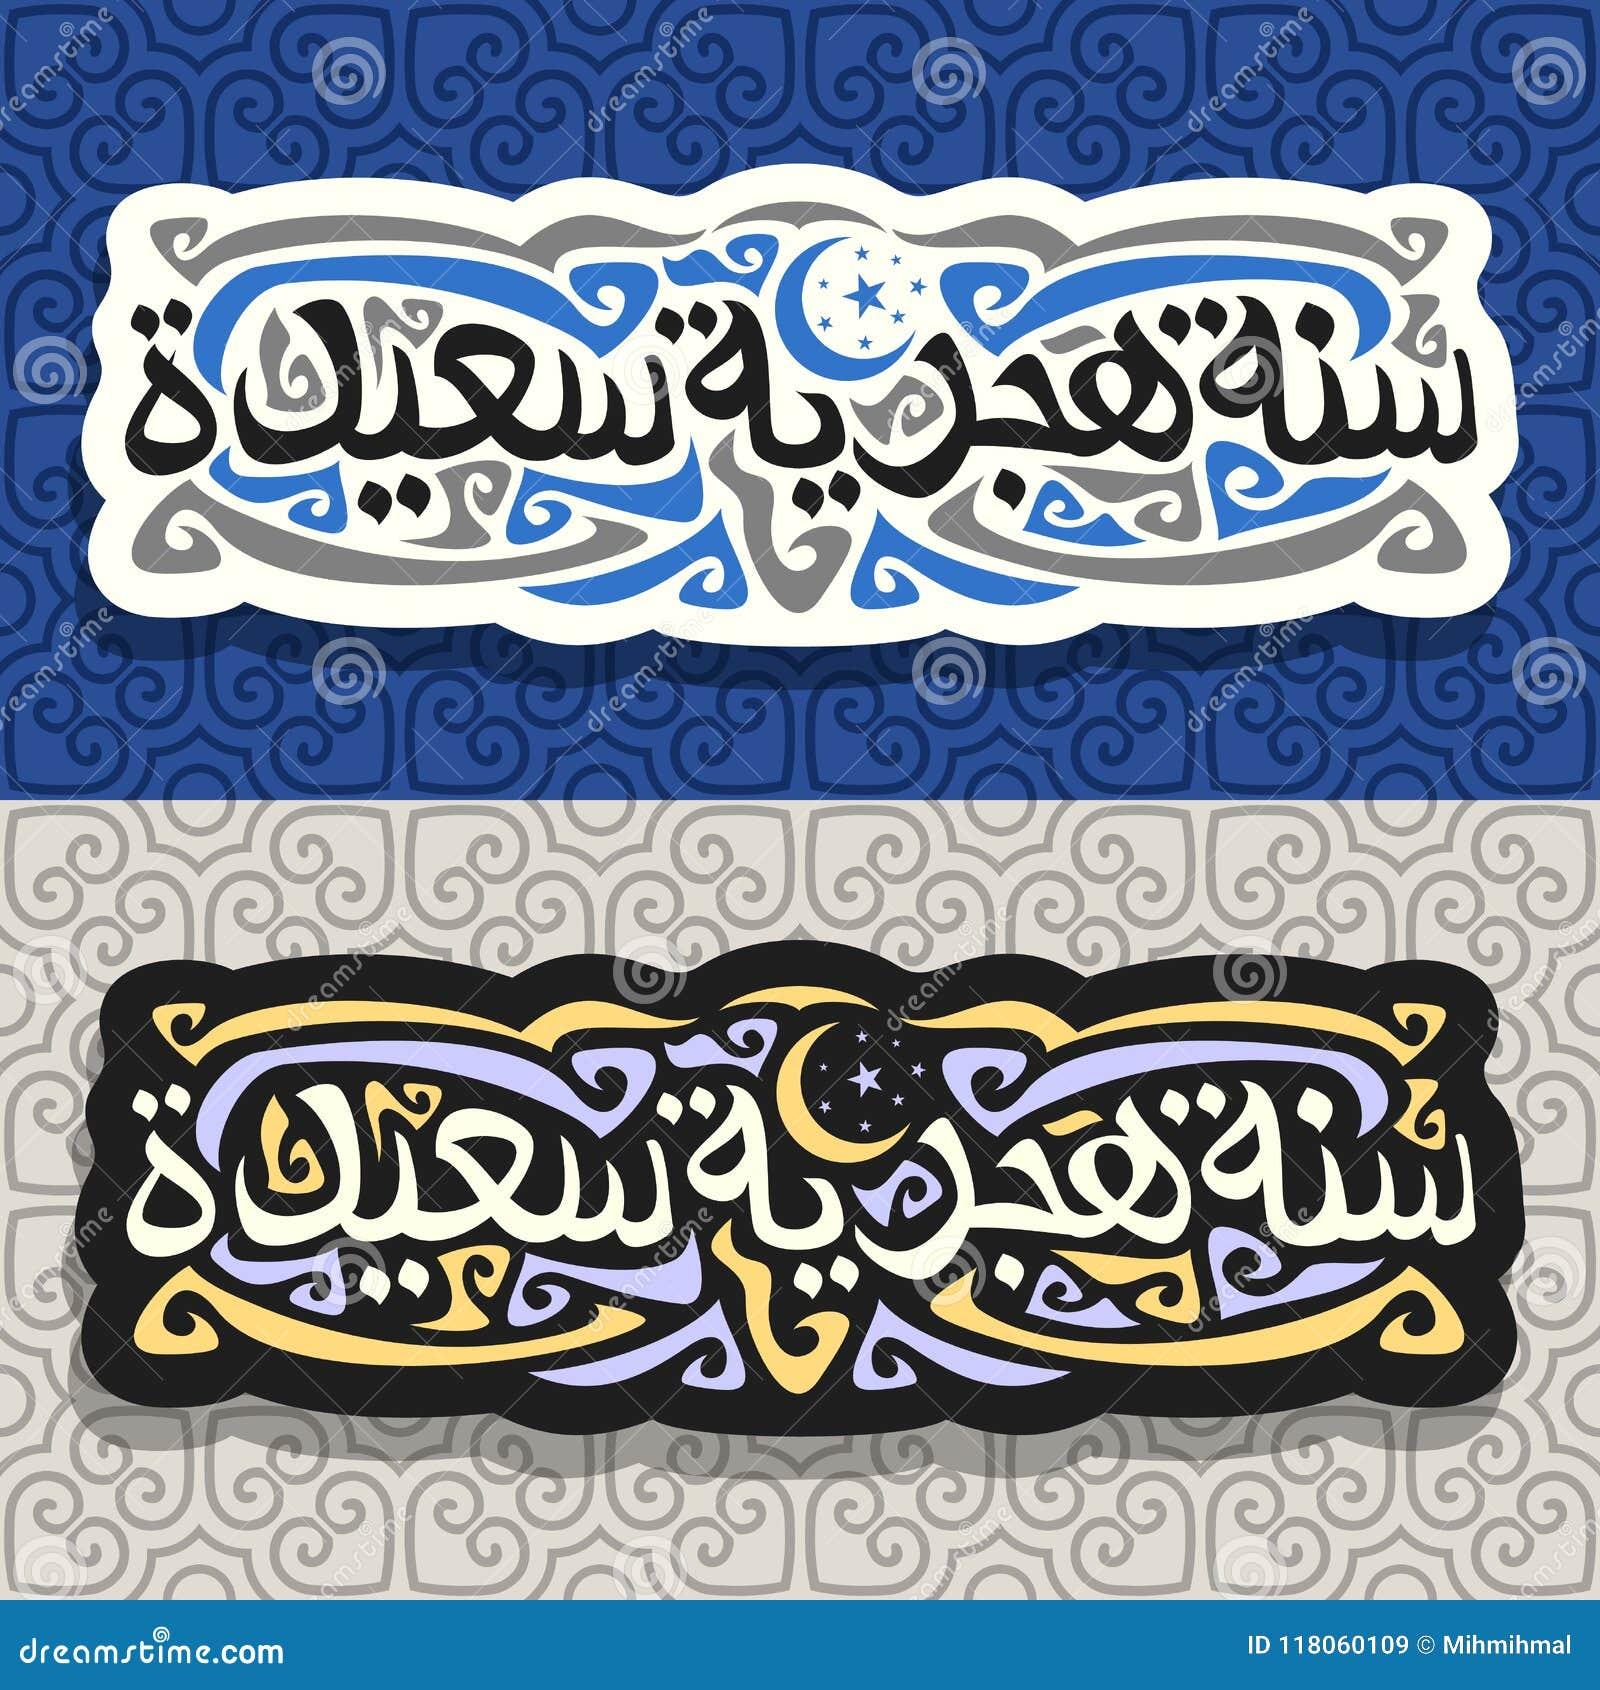 Vector Logos For Islamic New Year Stock Vector Illustration Of